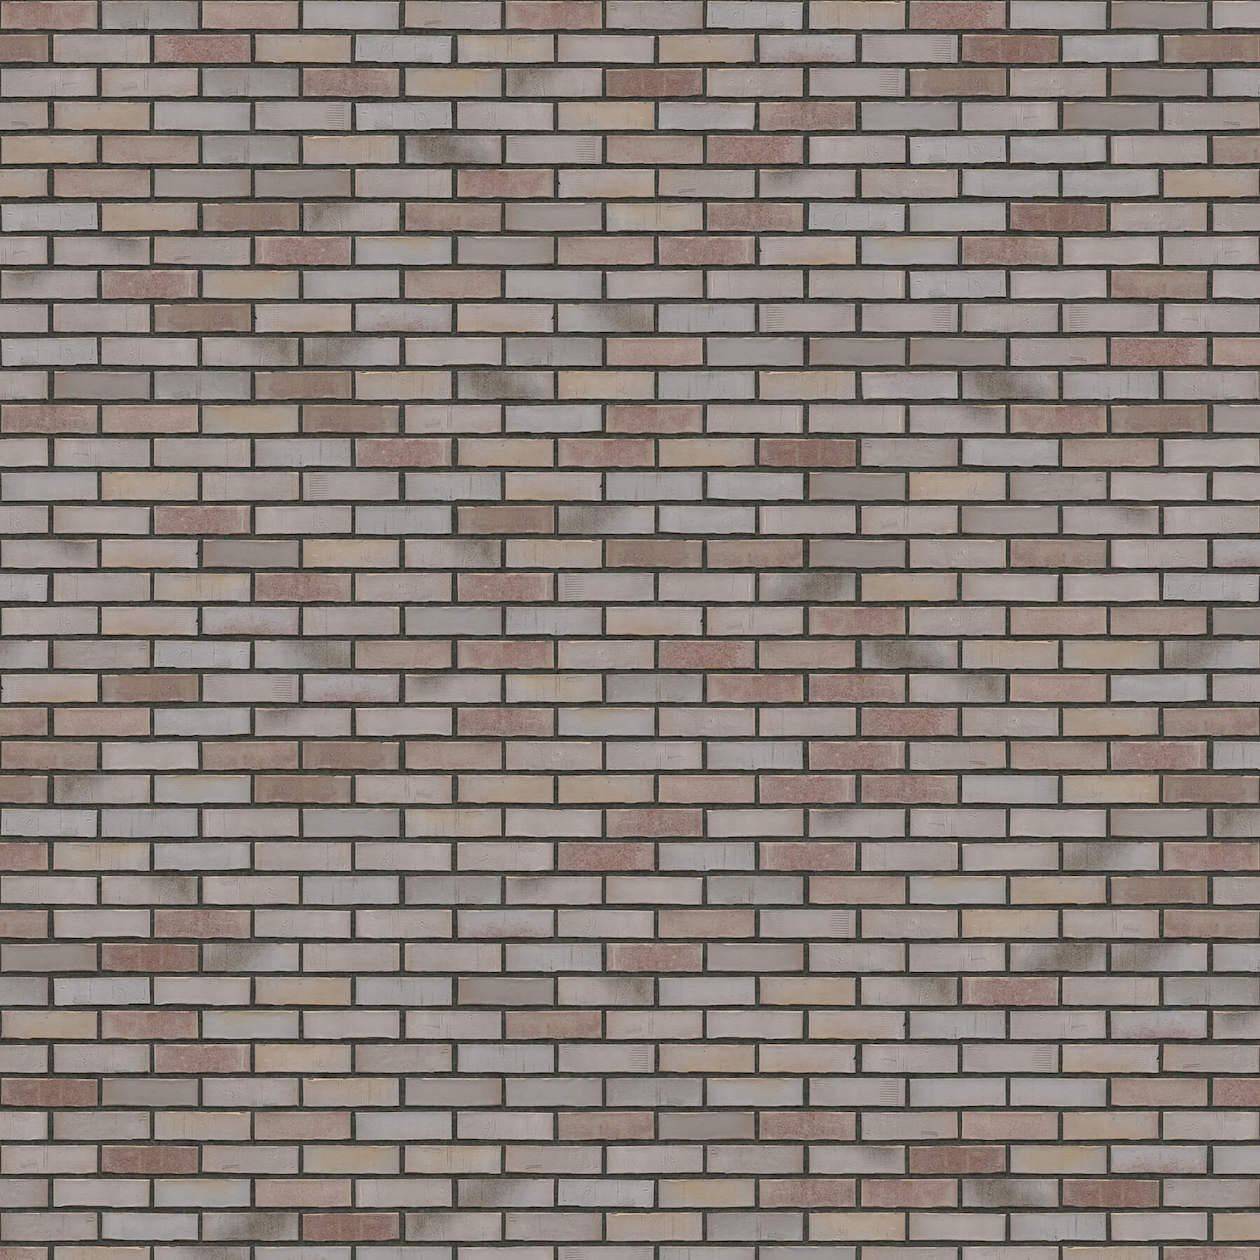 Puna-cigla-FeldHaus-Klinker-brick-house-Beograd-nf-k-707-Antracit Fuga